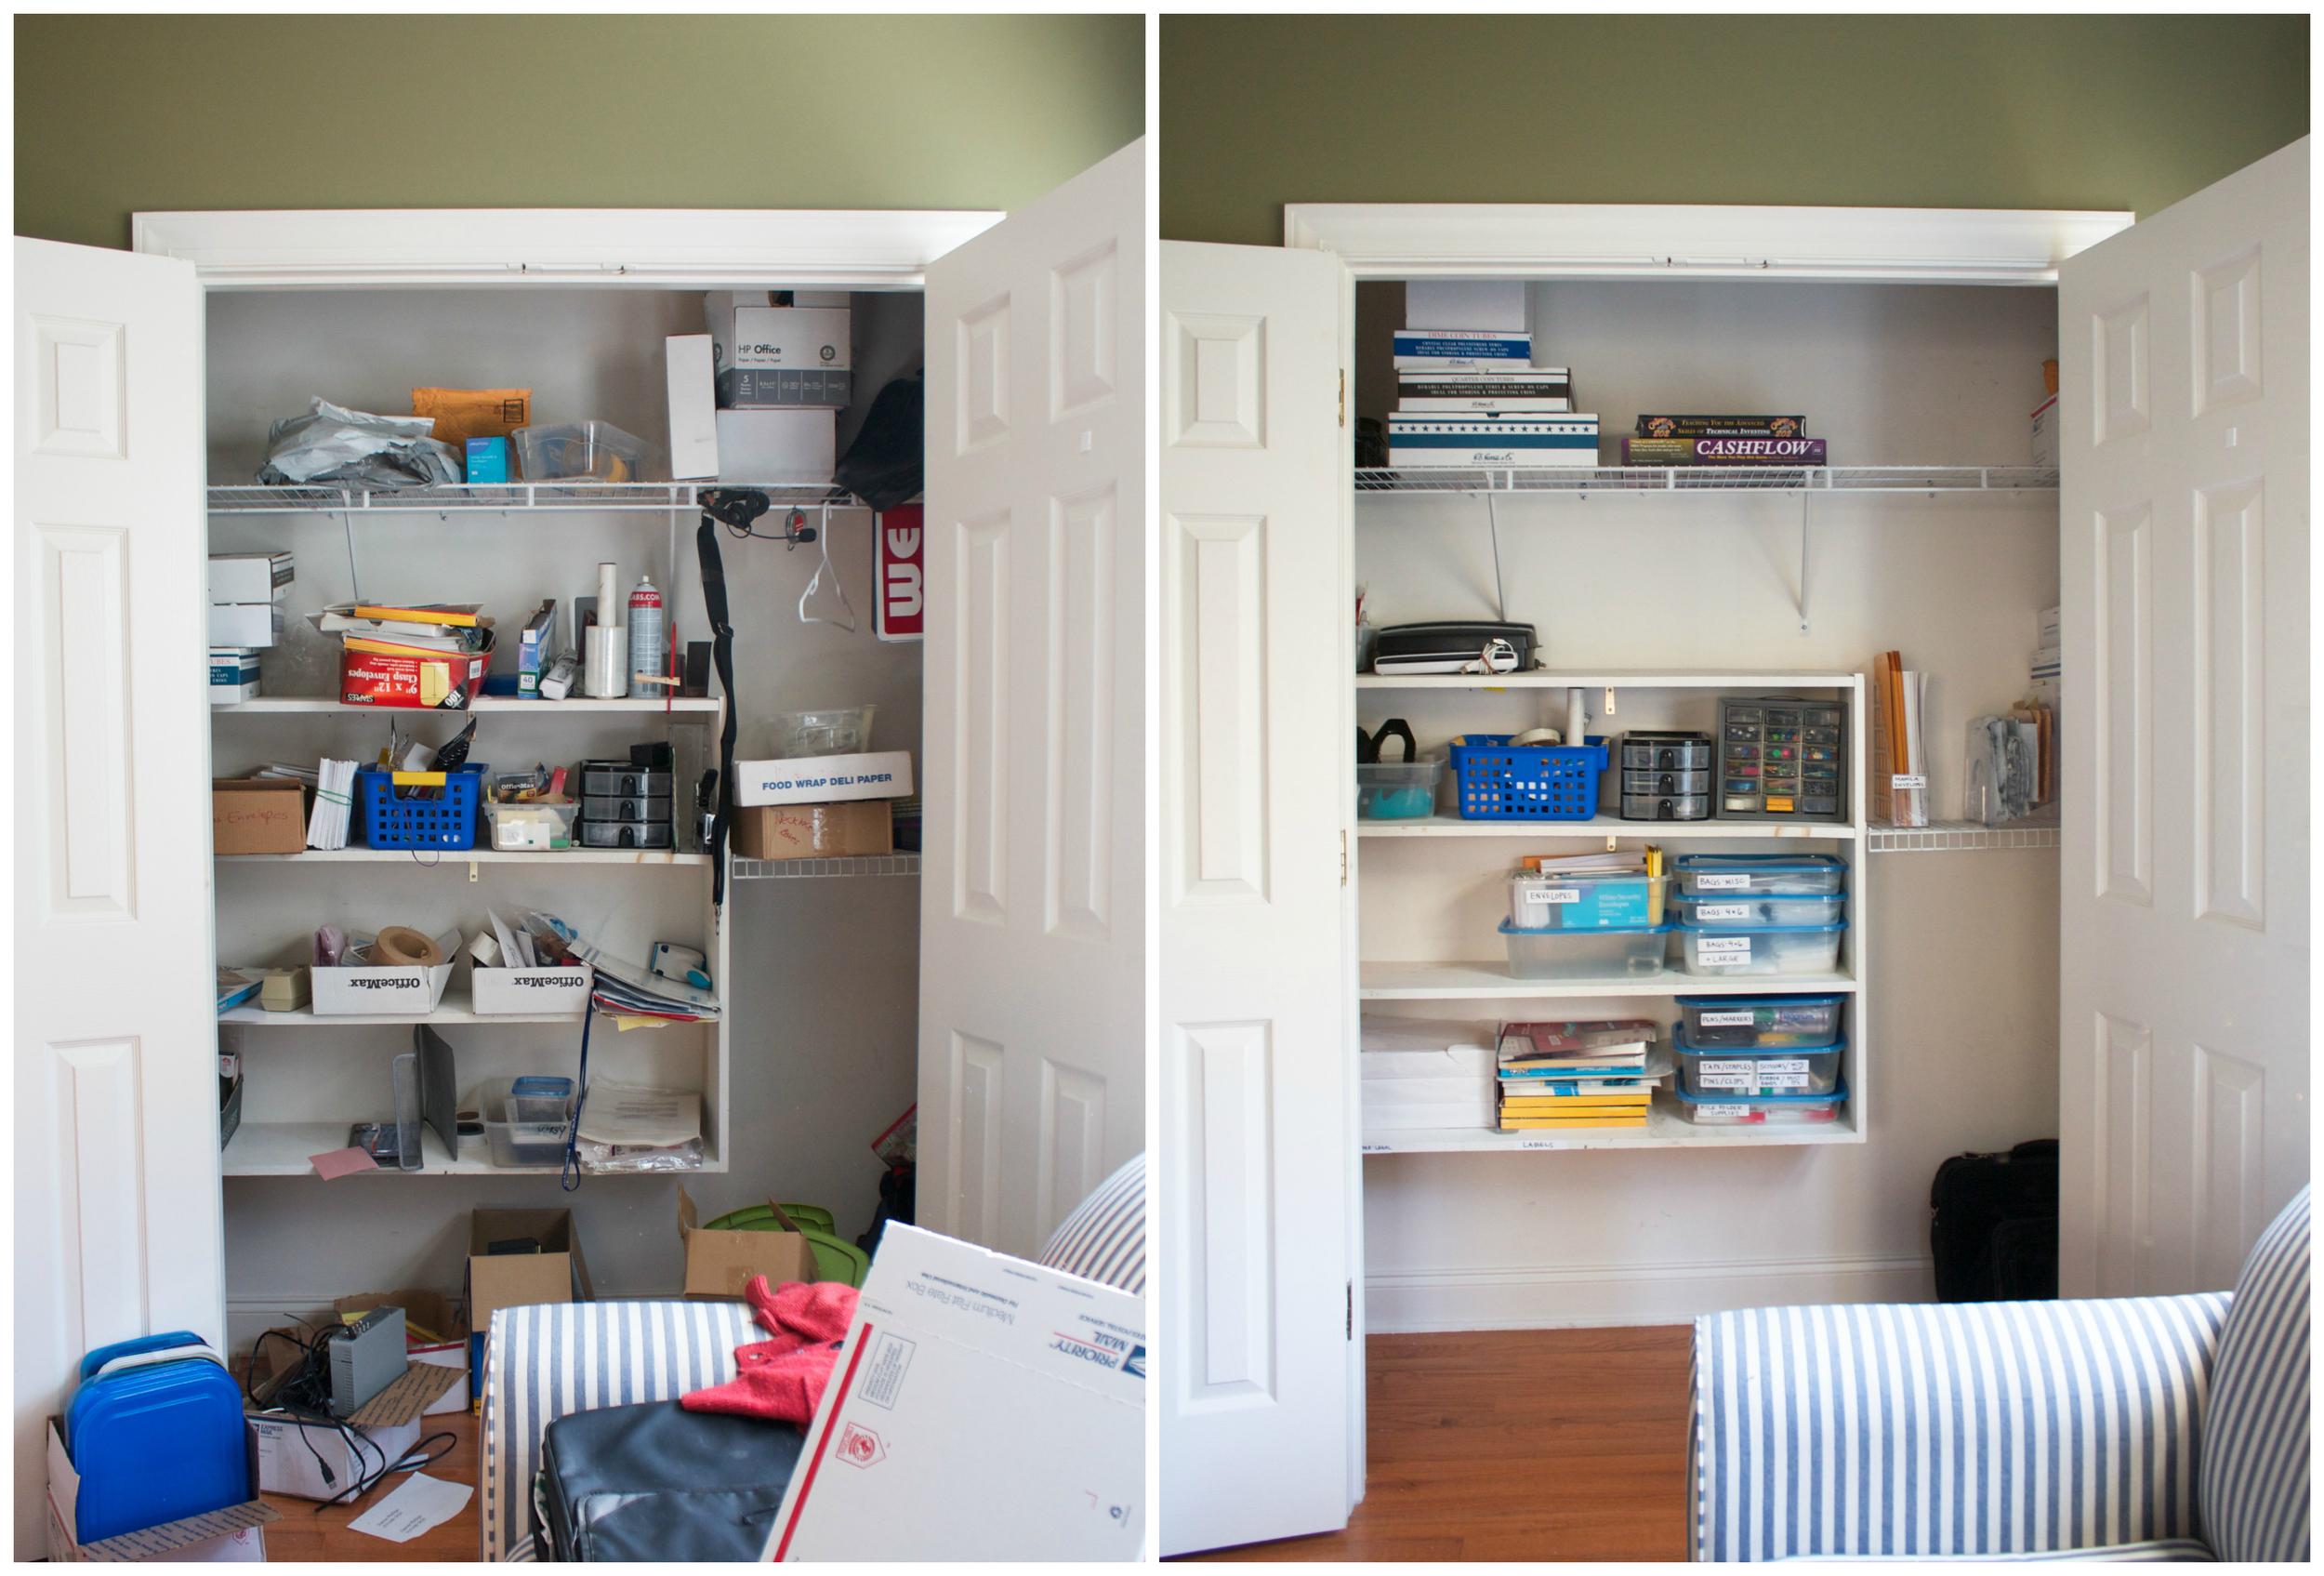 1 closet full v1 before after.jpg